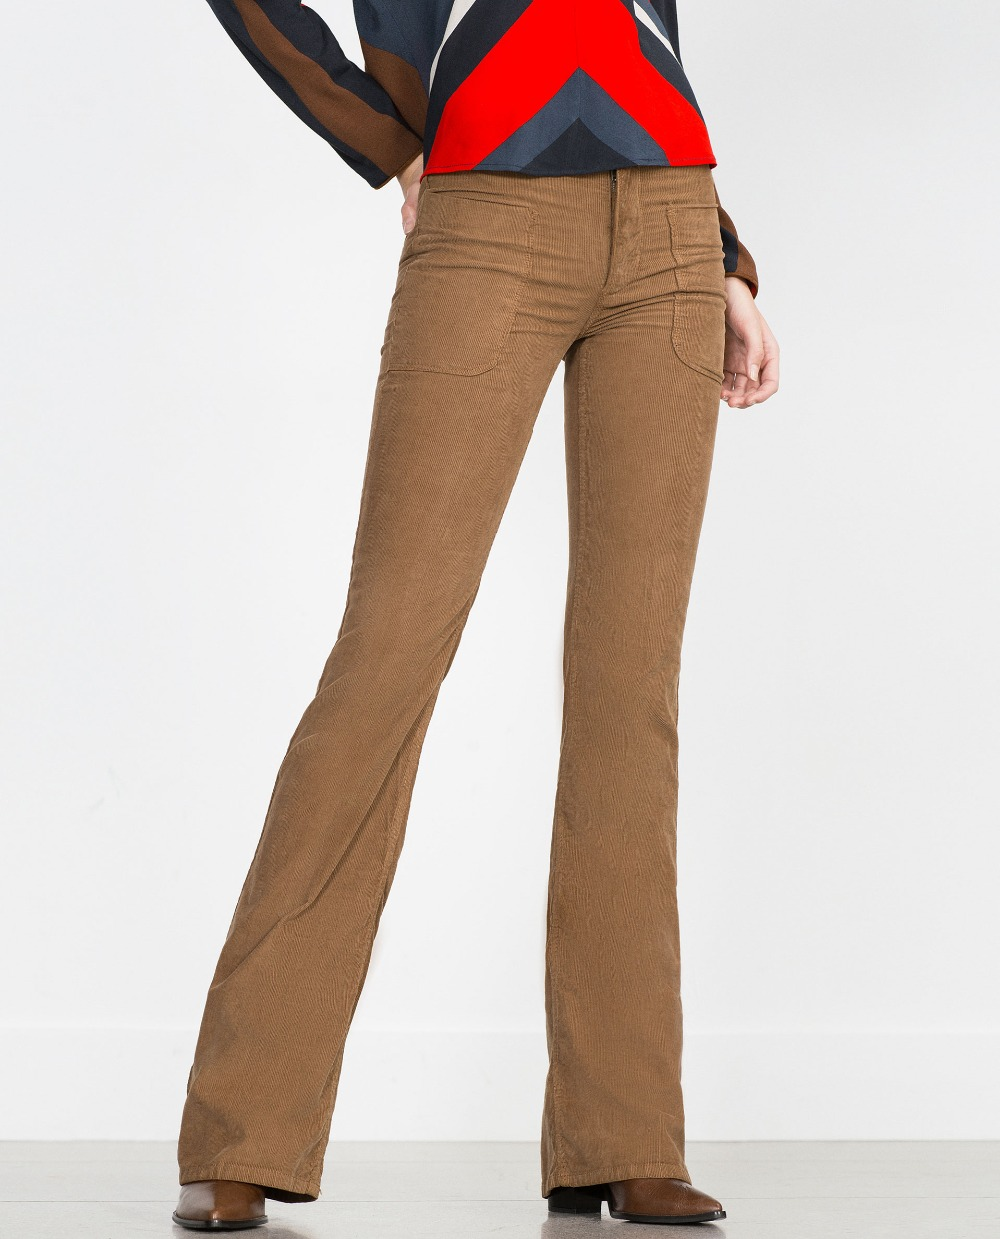 Popular Corduroy Trousers Women-Buy Cheap Corduroy Trousers Women